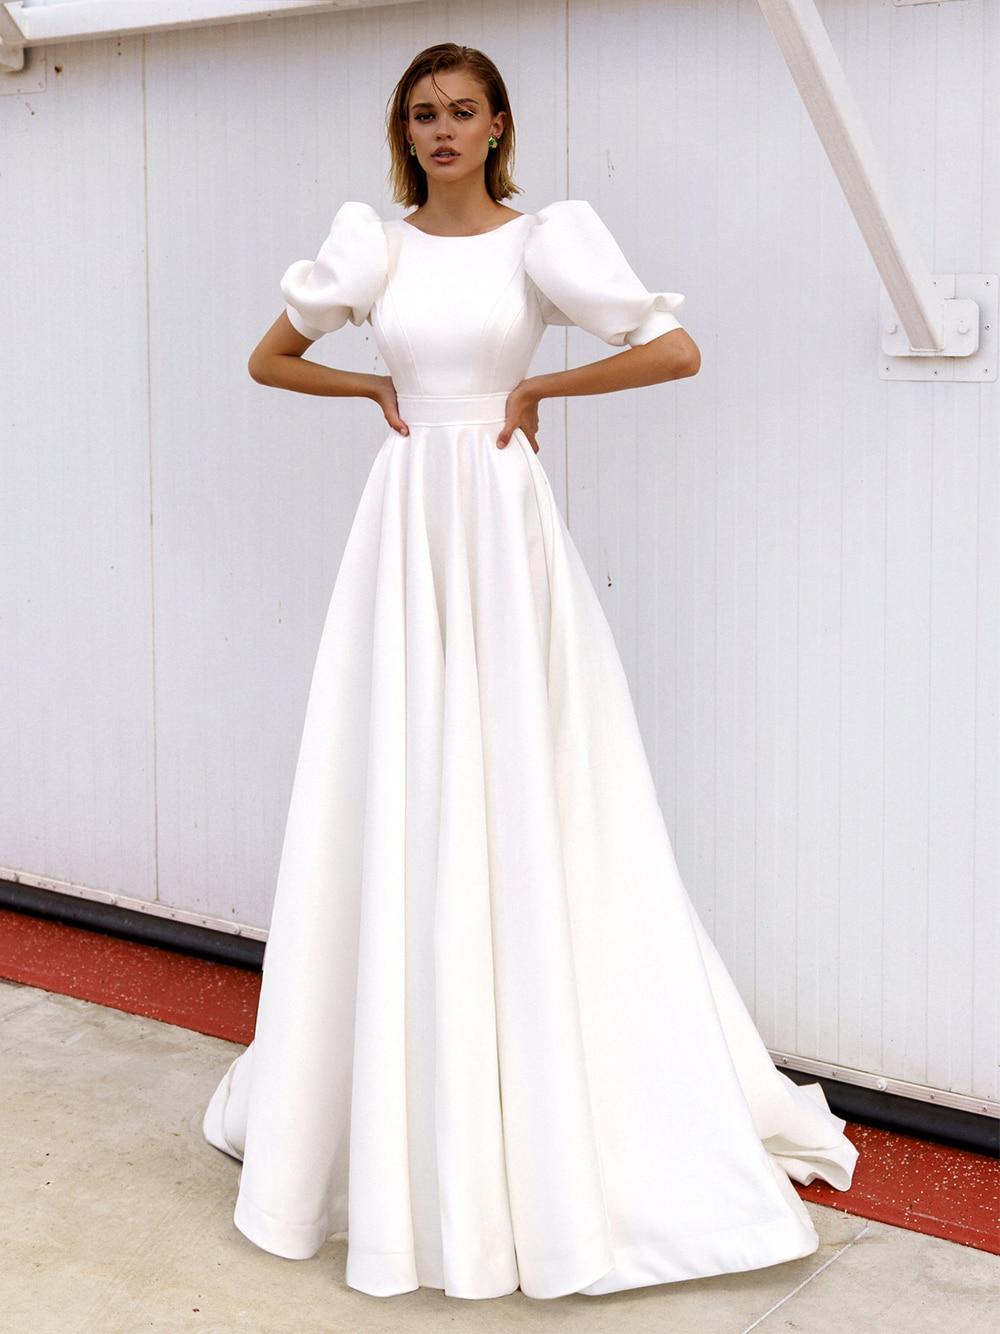 Satin Short Lantern Sleeves Wedding Dress Simple Round Neck Waist Cinching Minimalist Mini Bridal Gowns Hollow Back Buttons 2021